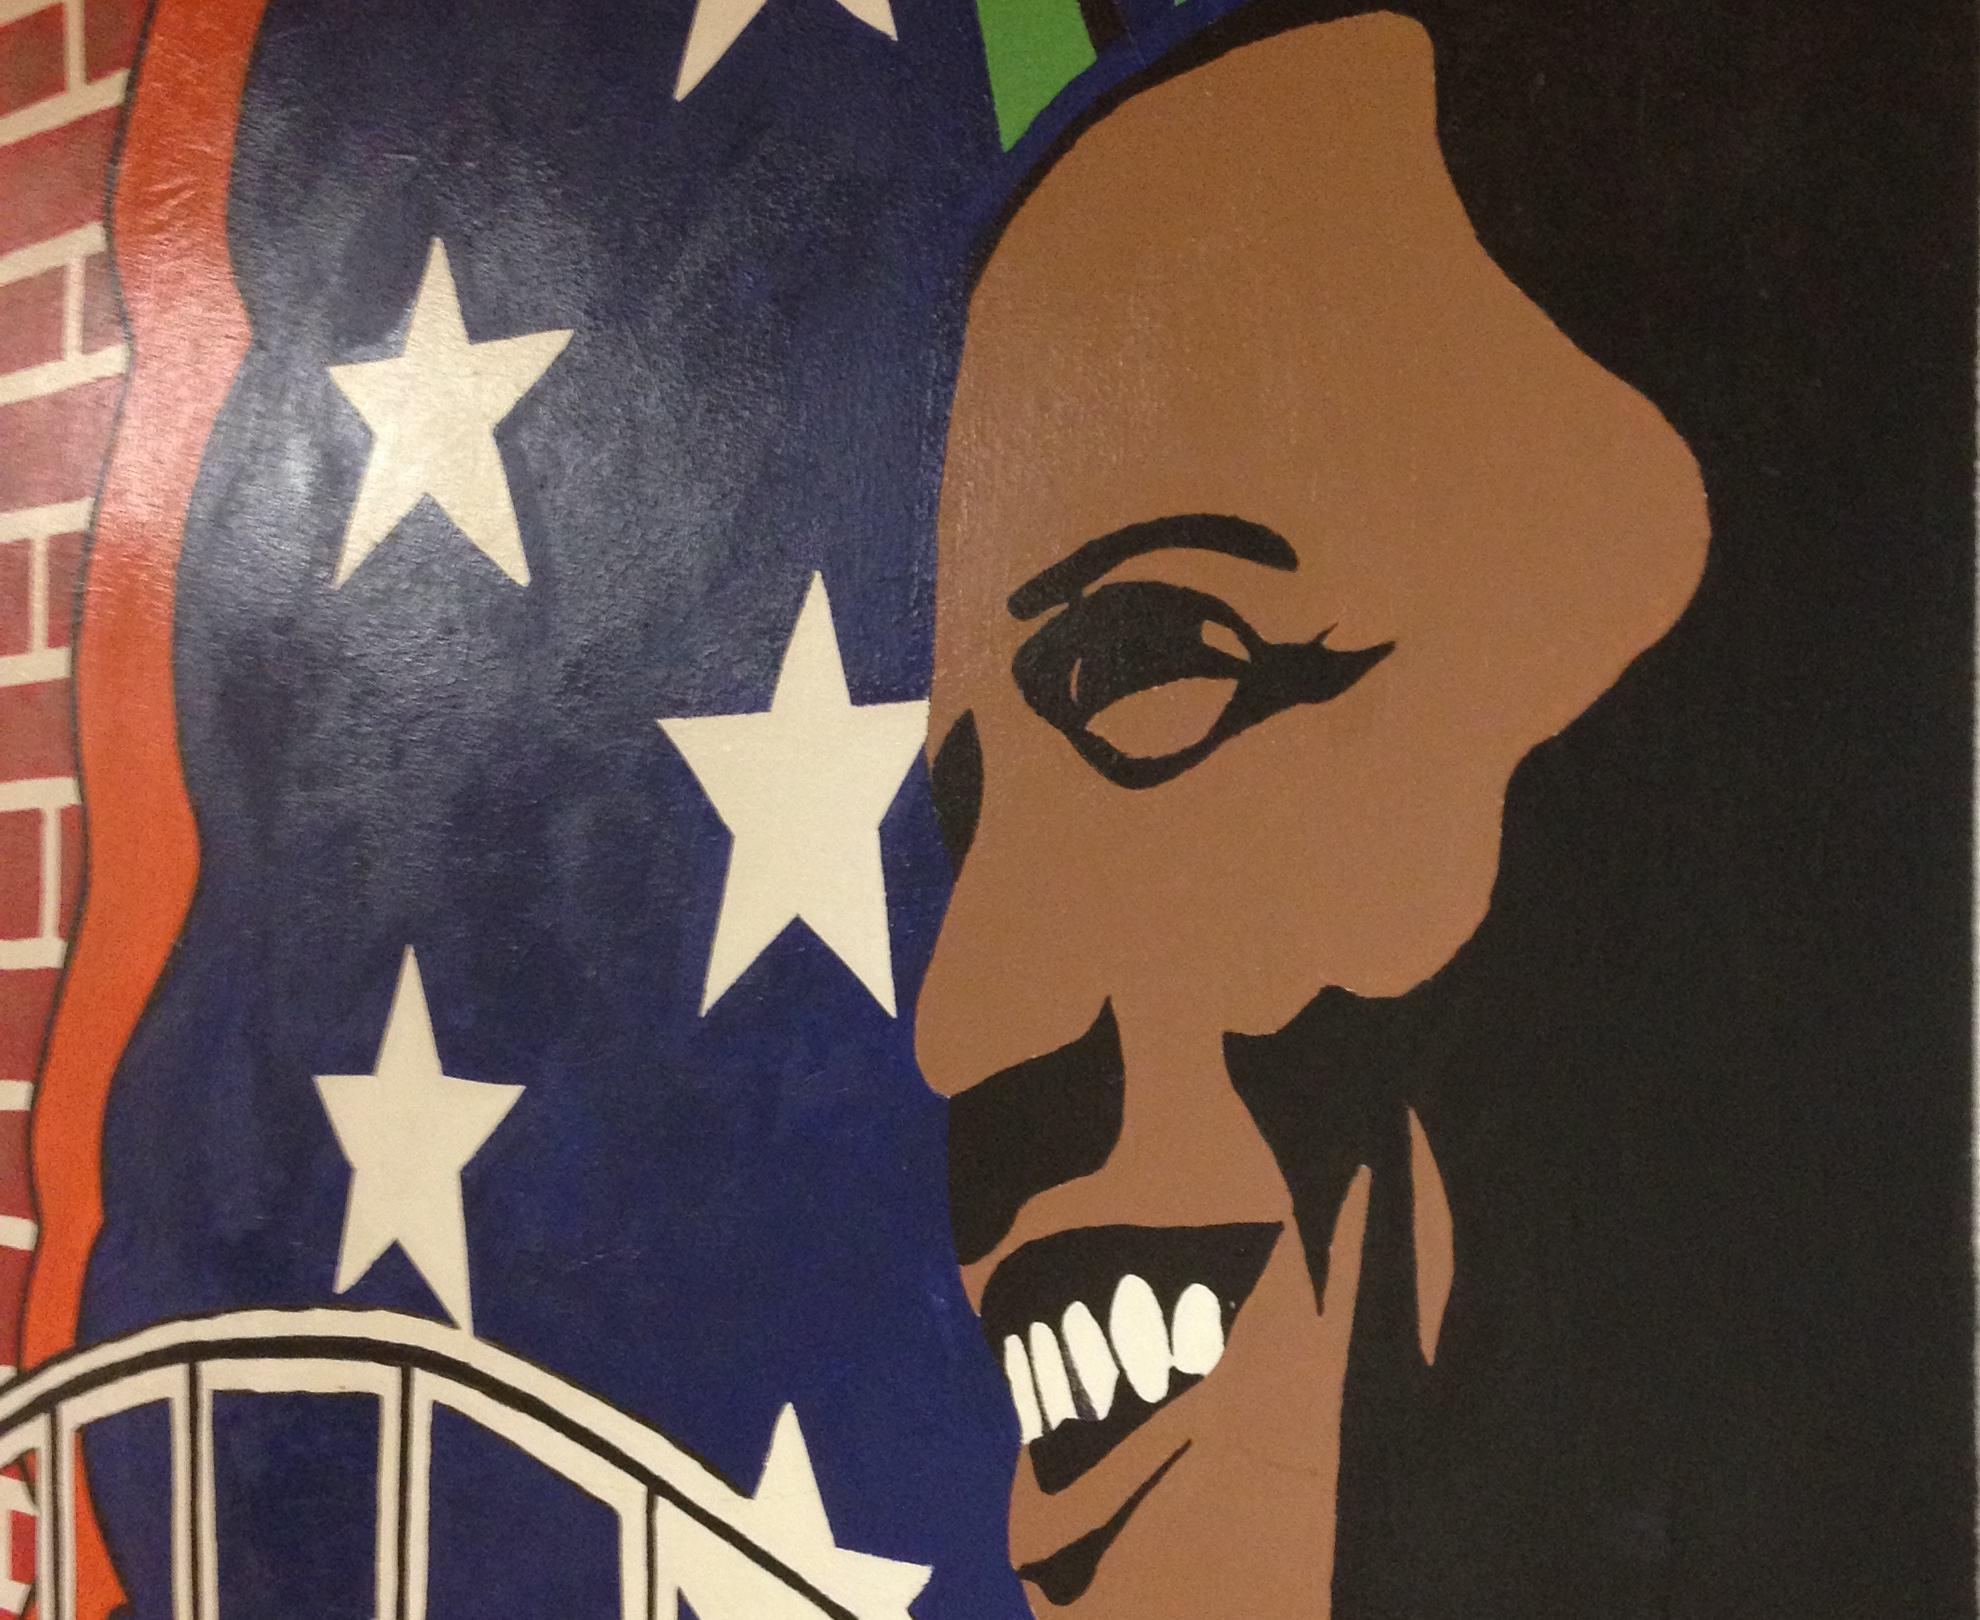 New York Public School displays Obama mural